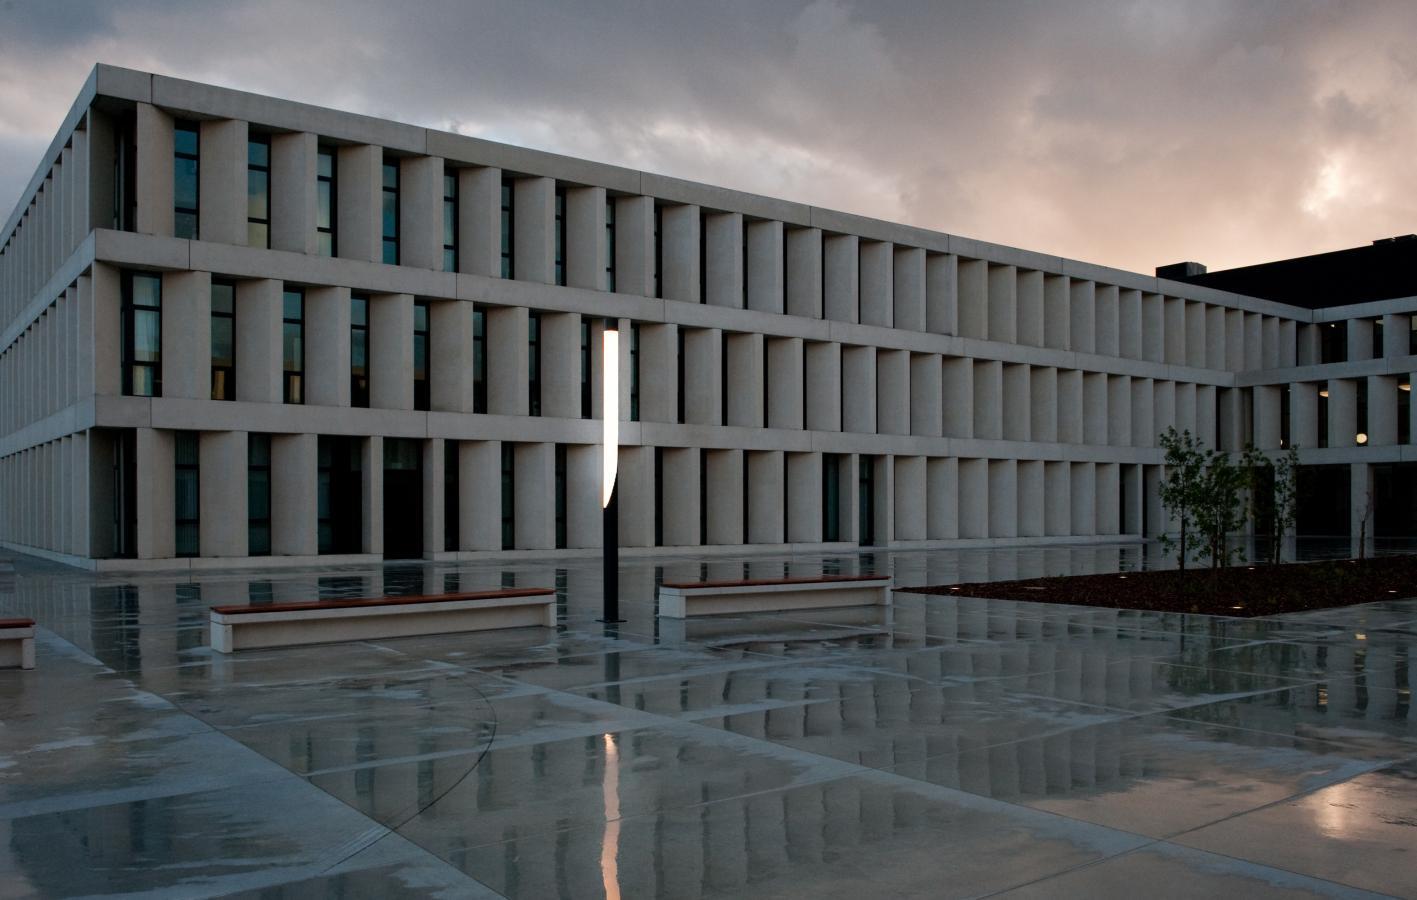 az-groeninge-kortrijk-for-osar-architects